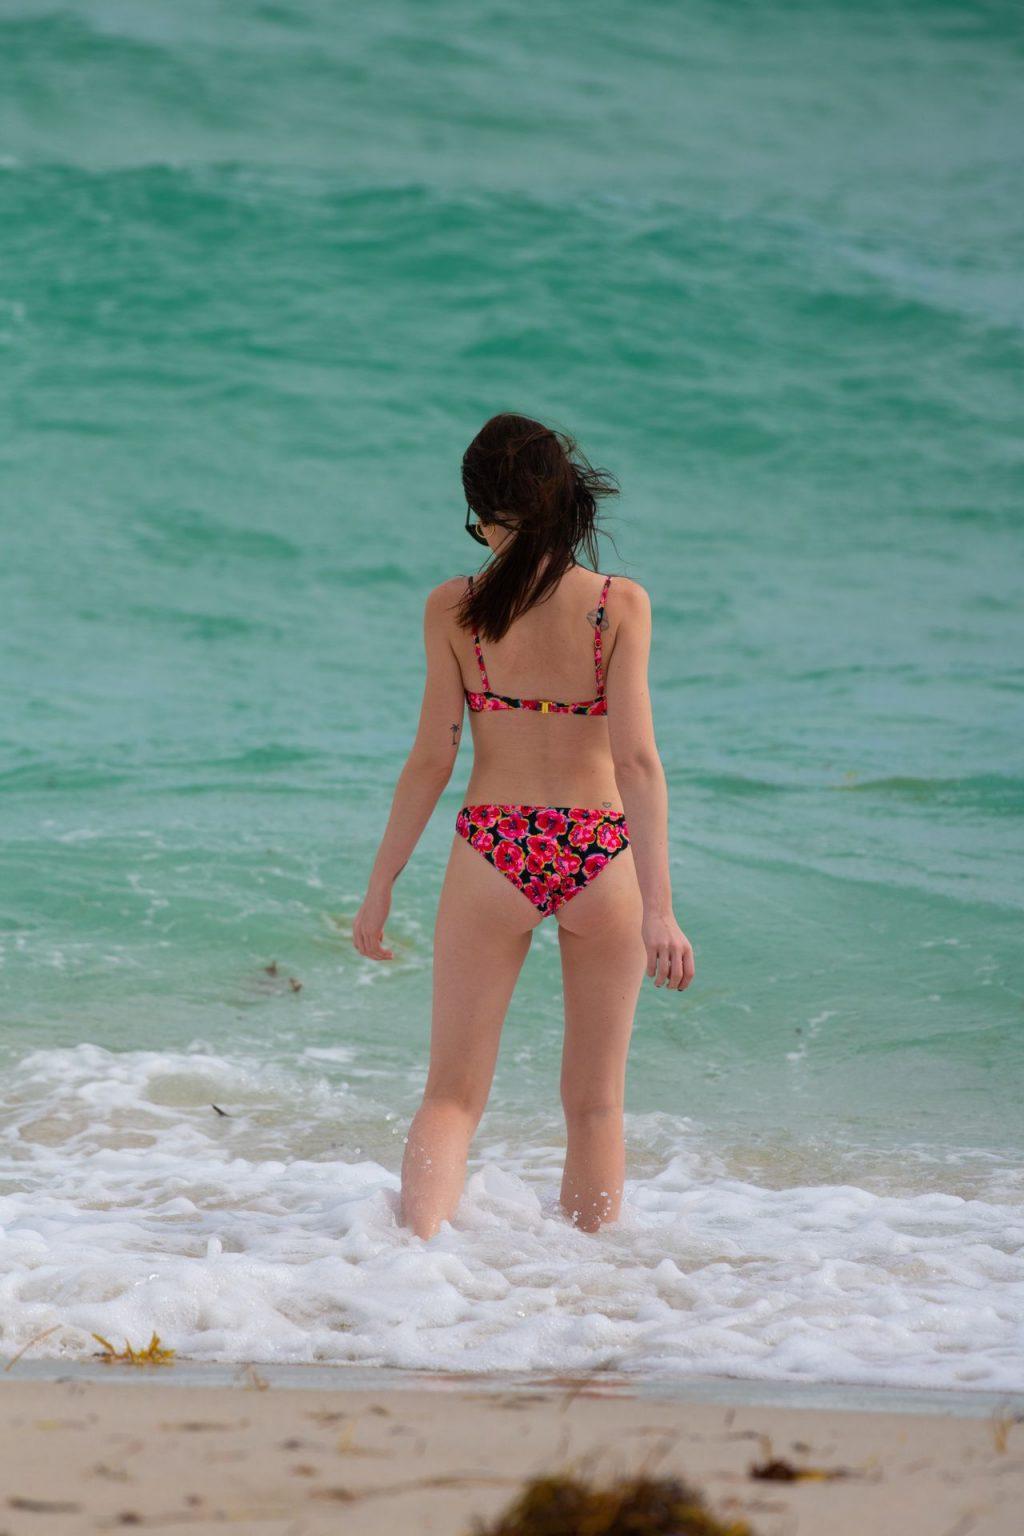 Urszula Makowska is Seen in Miami Beach (24 Sexy Photos)